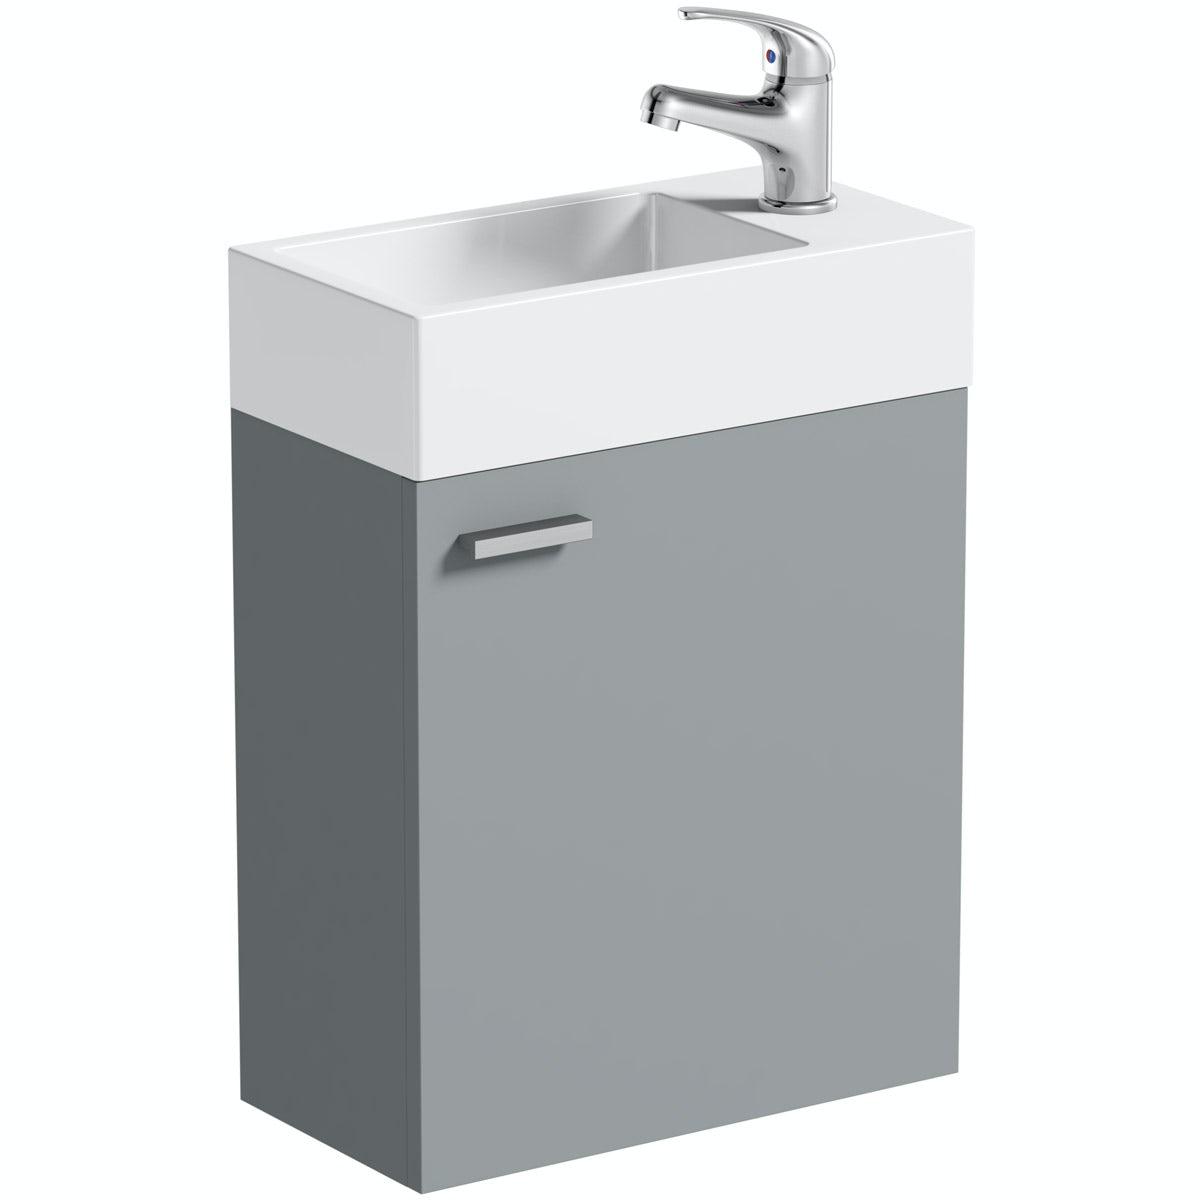 Clarity Compact satin grey wall hung vanity unit and basin 410mm